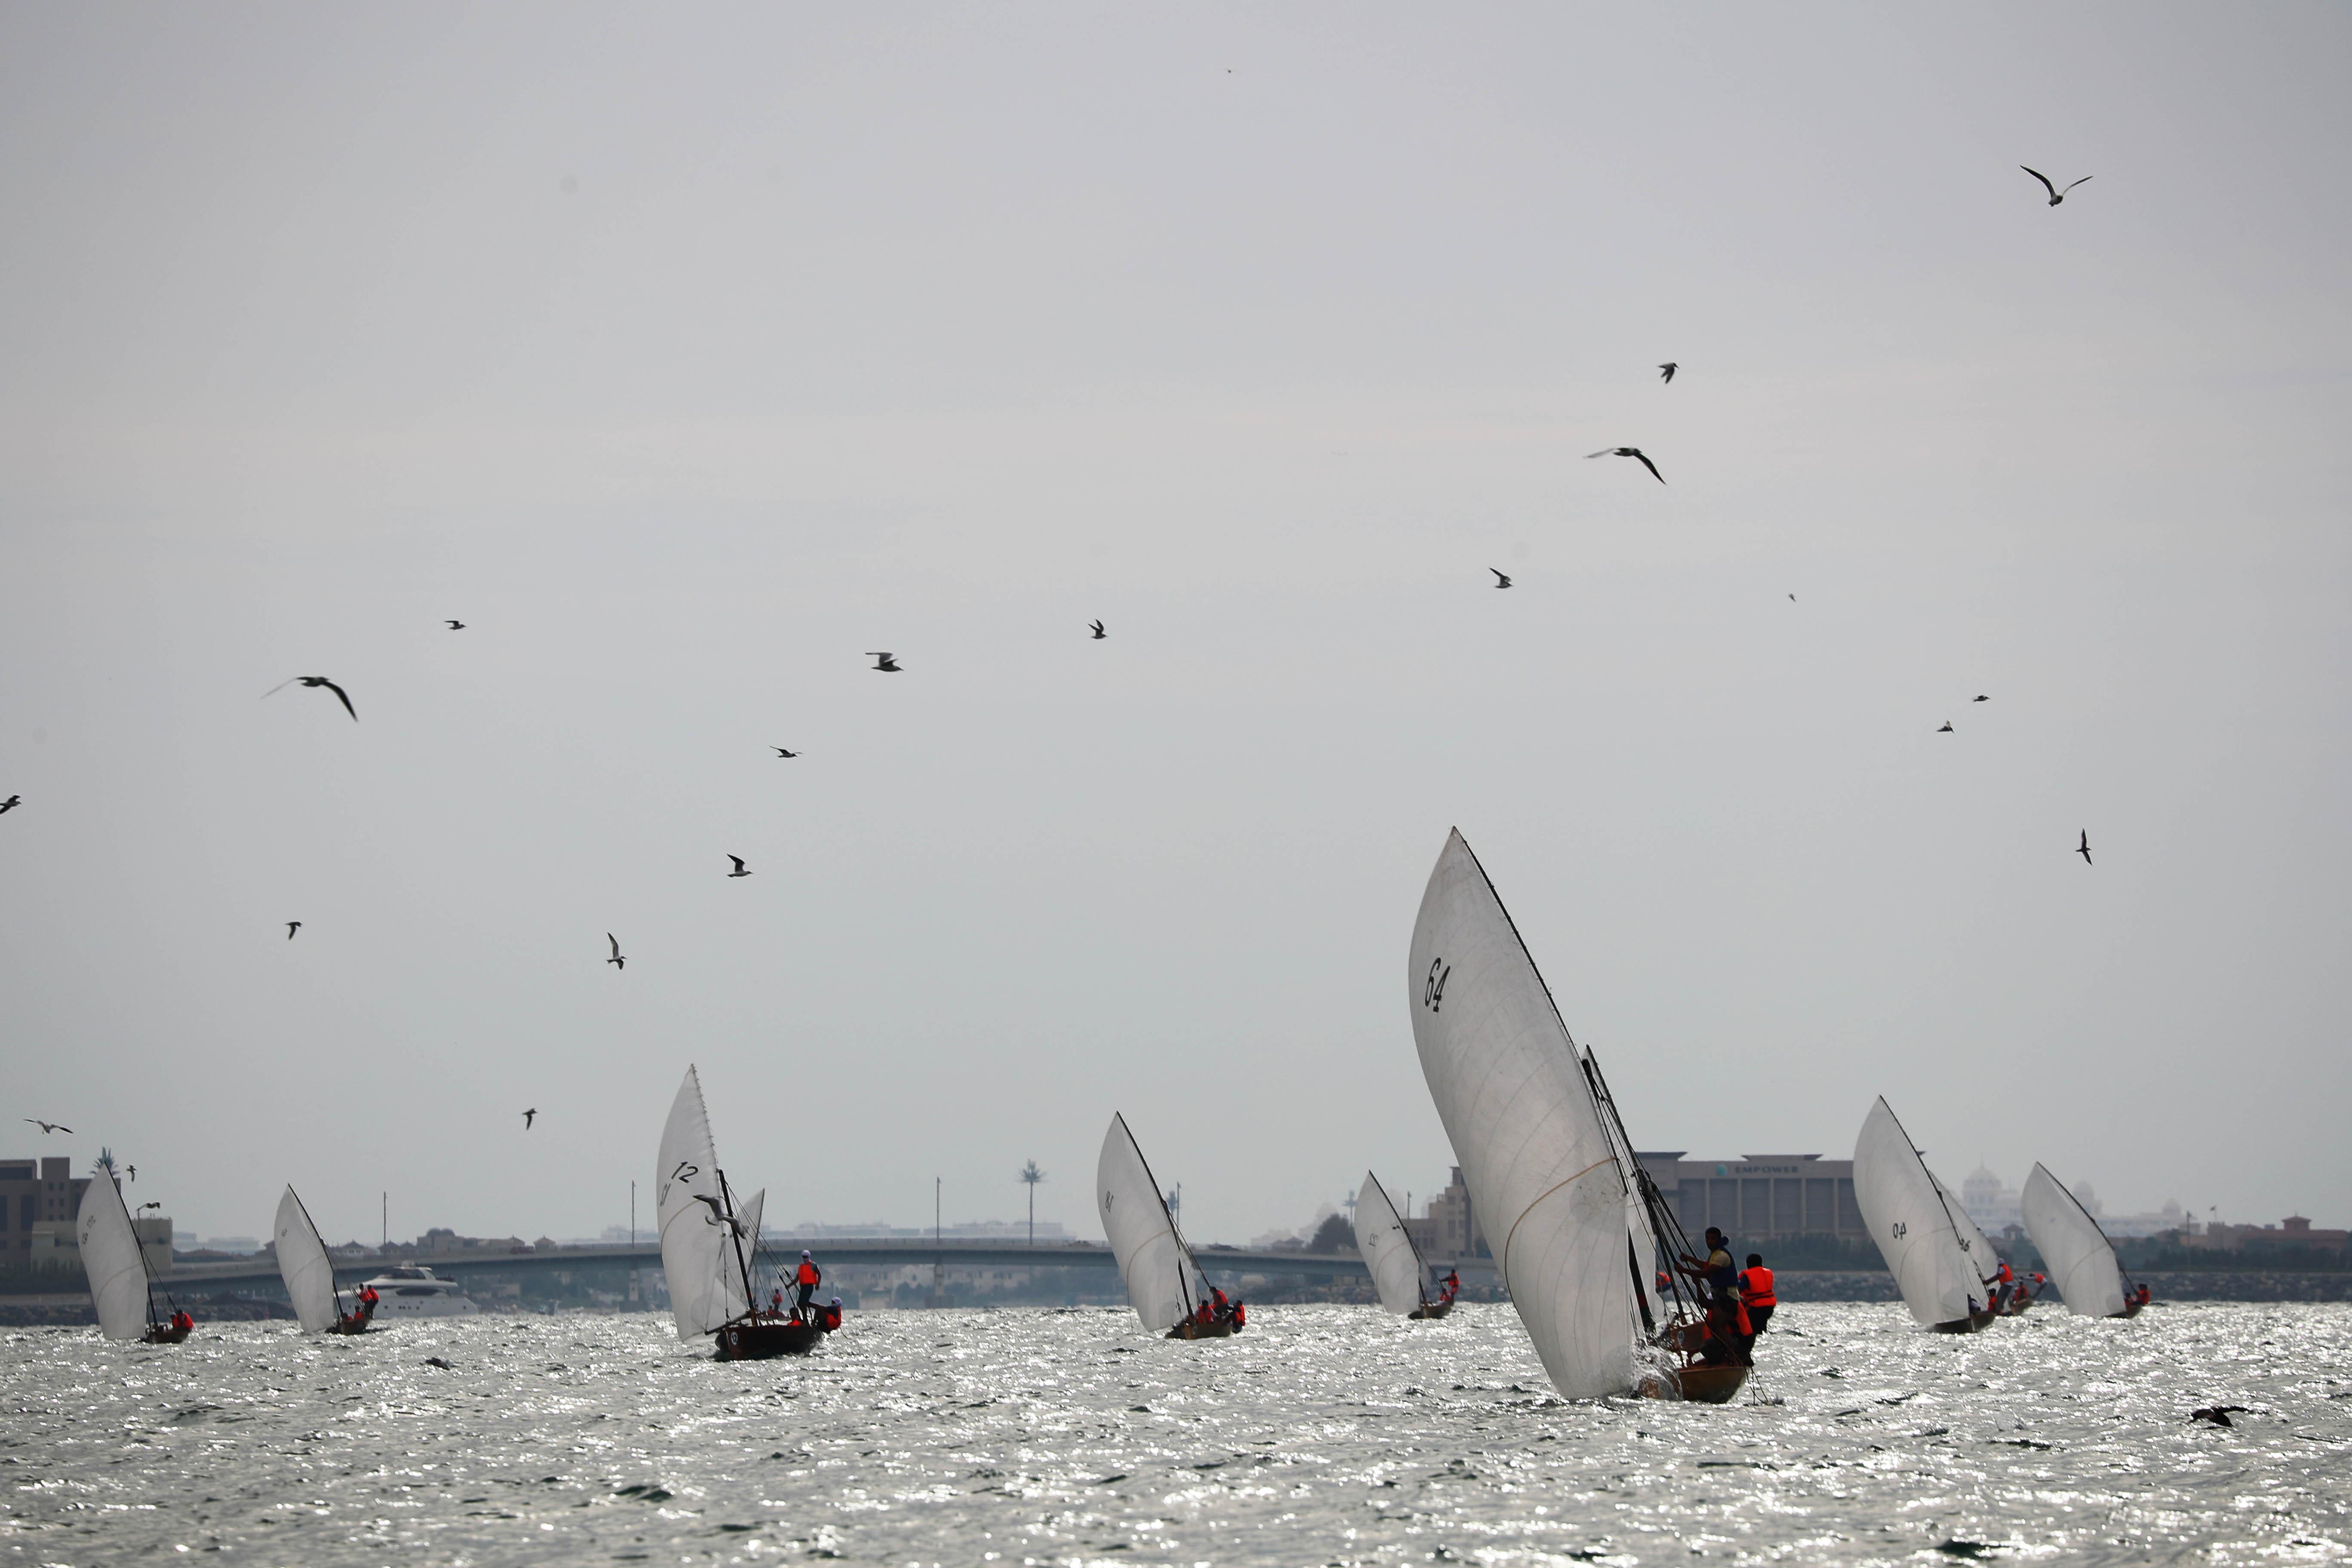 22ft Dubai Traditional Dhow Sailing Race Kicks off tomorrow